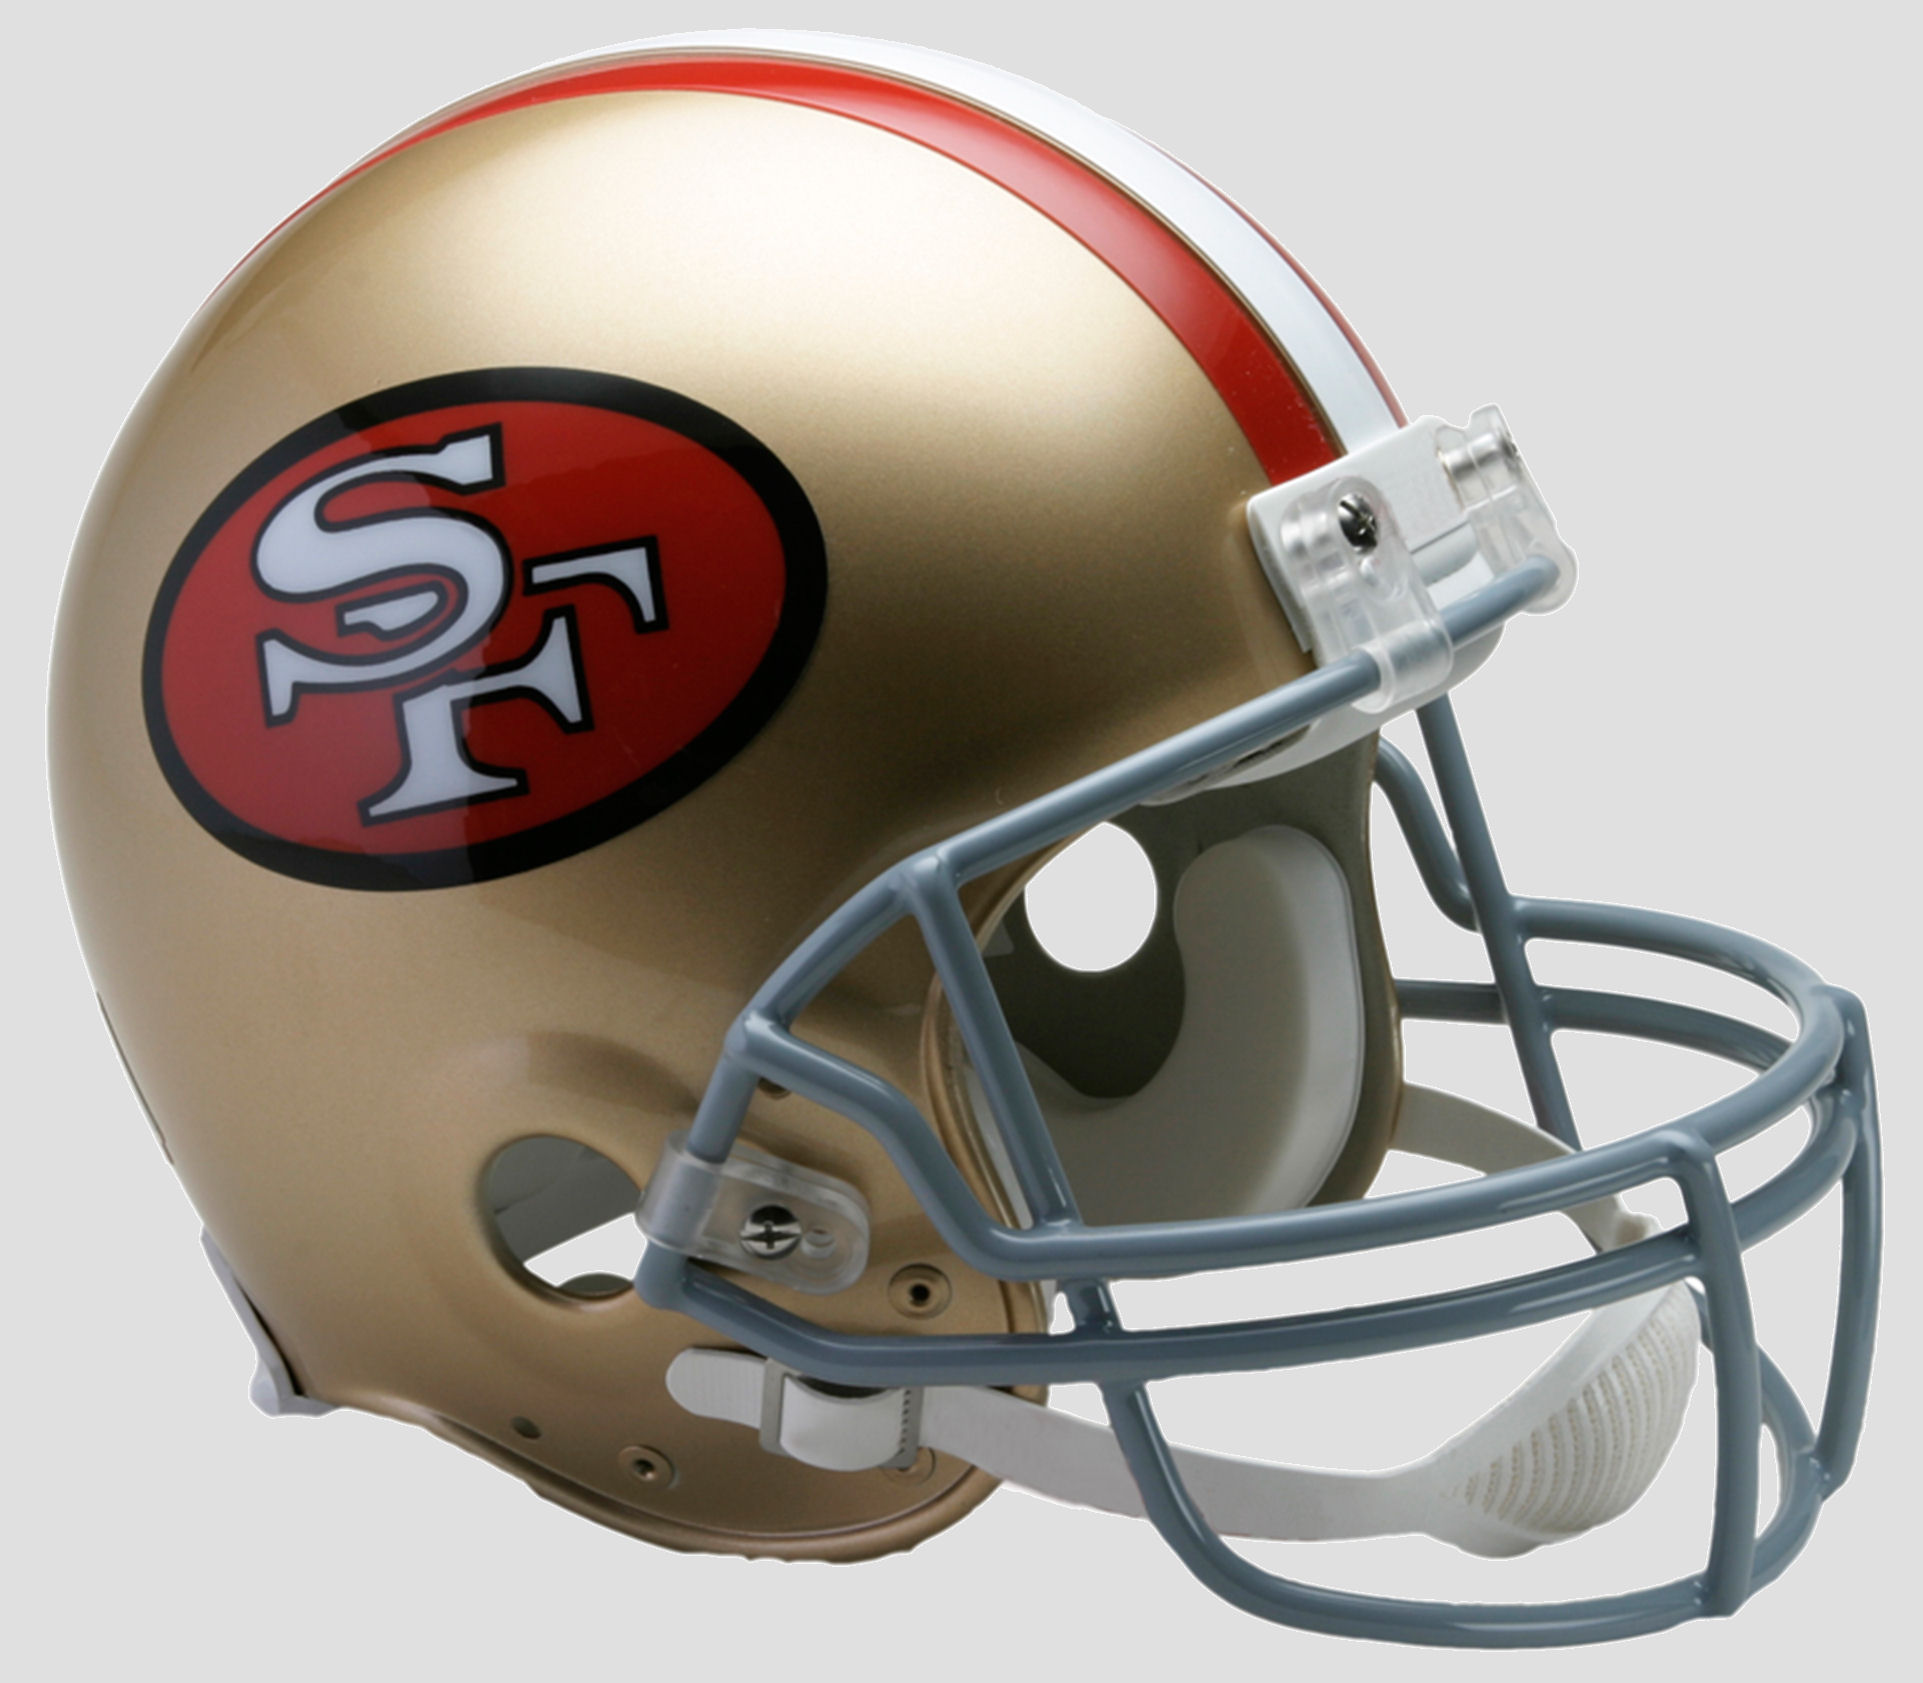 San Francisco 49ers 1964 to 1995 Football Helmet